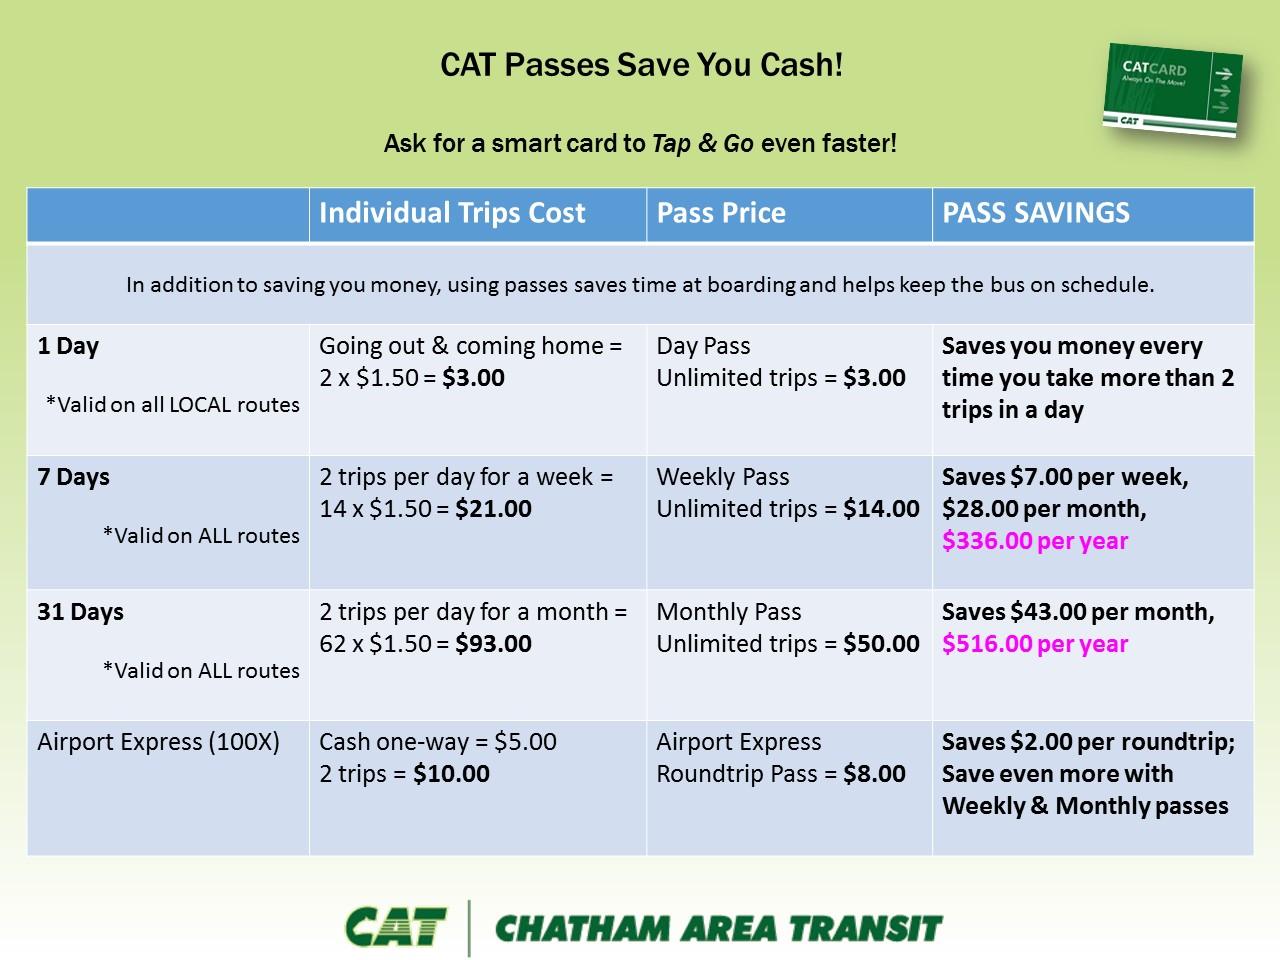 Savings-Fares-Cat-passes-2016-oct